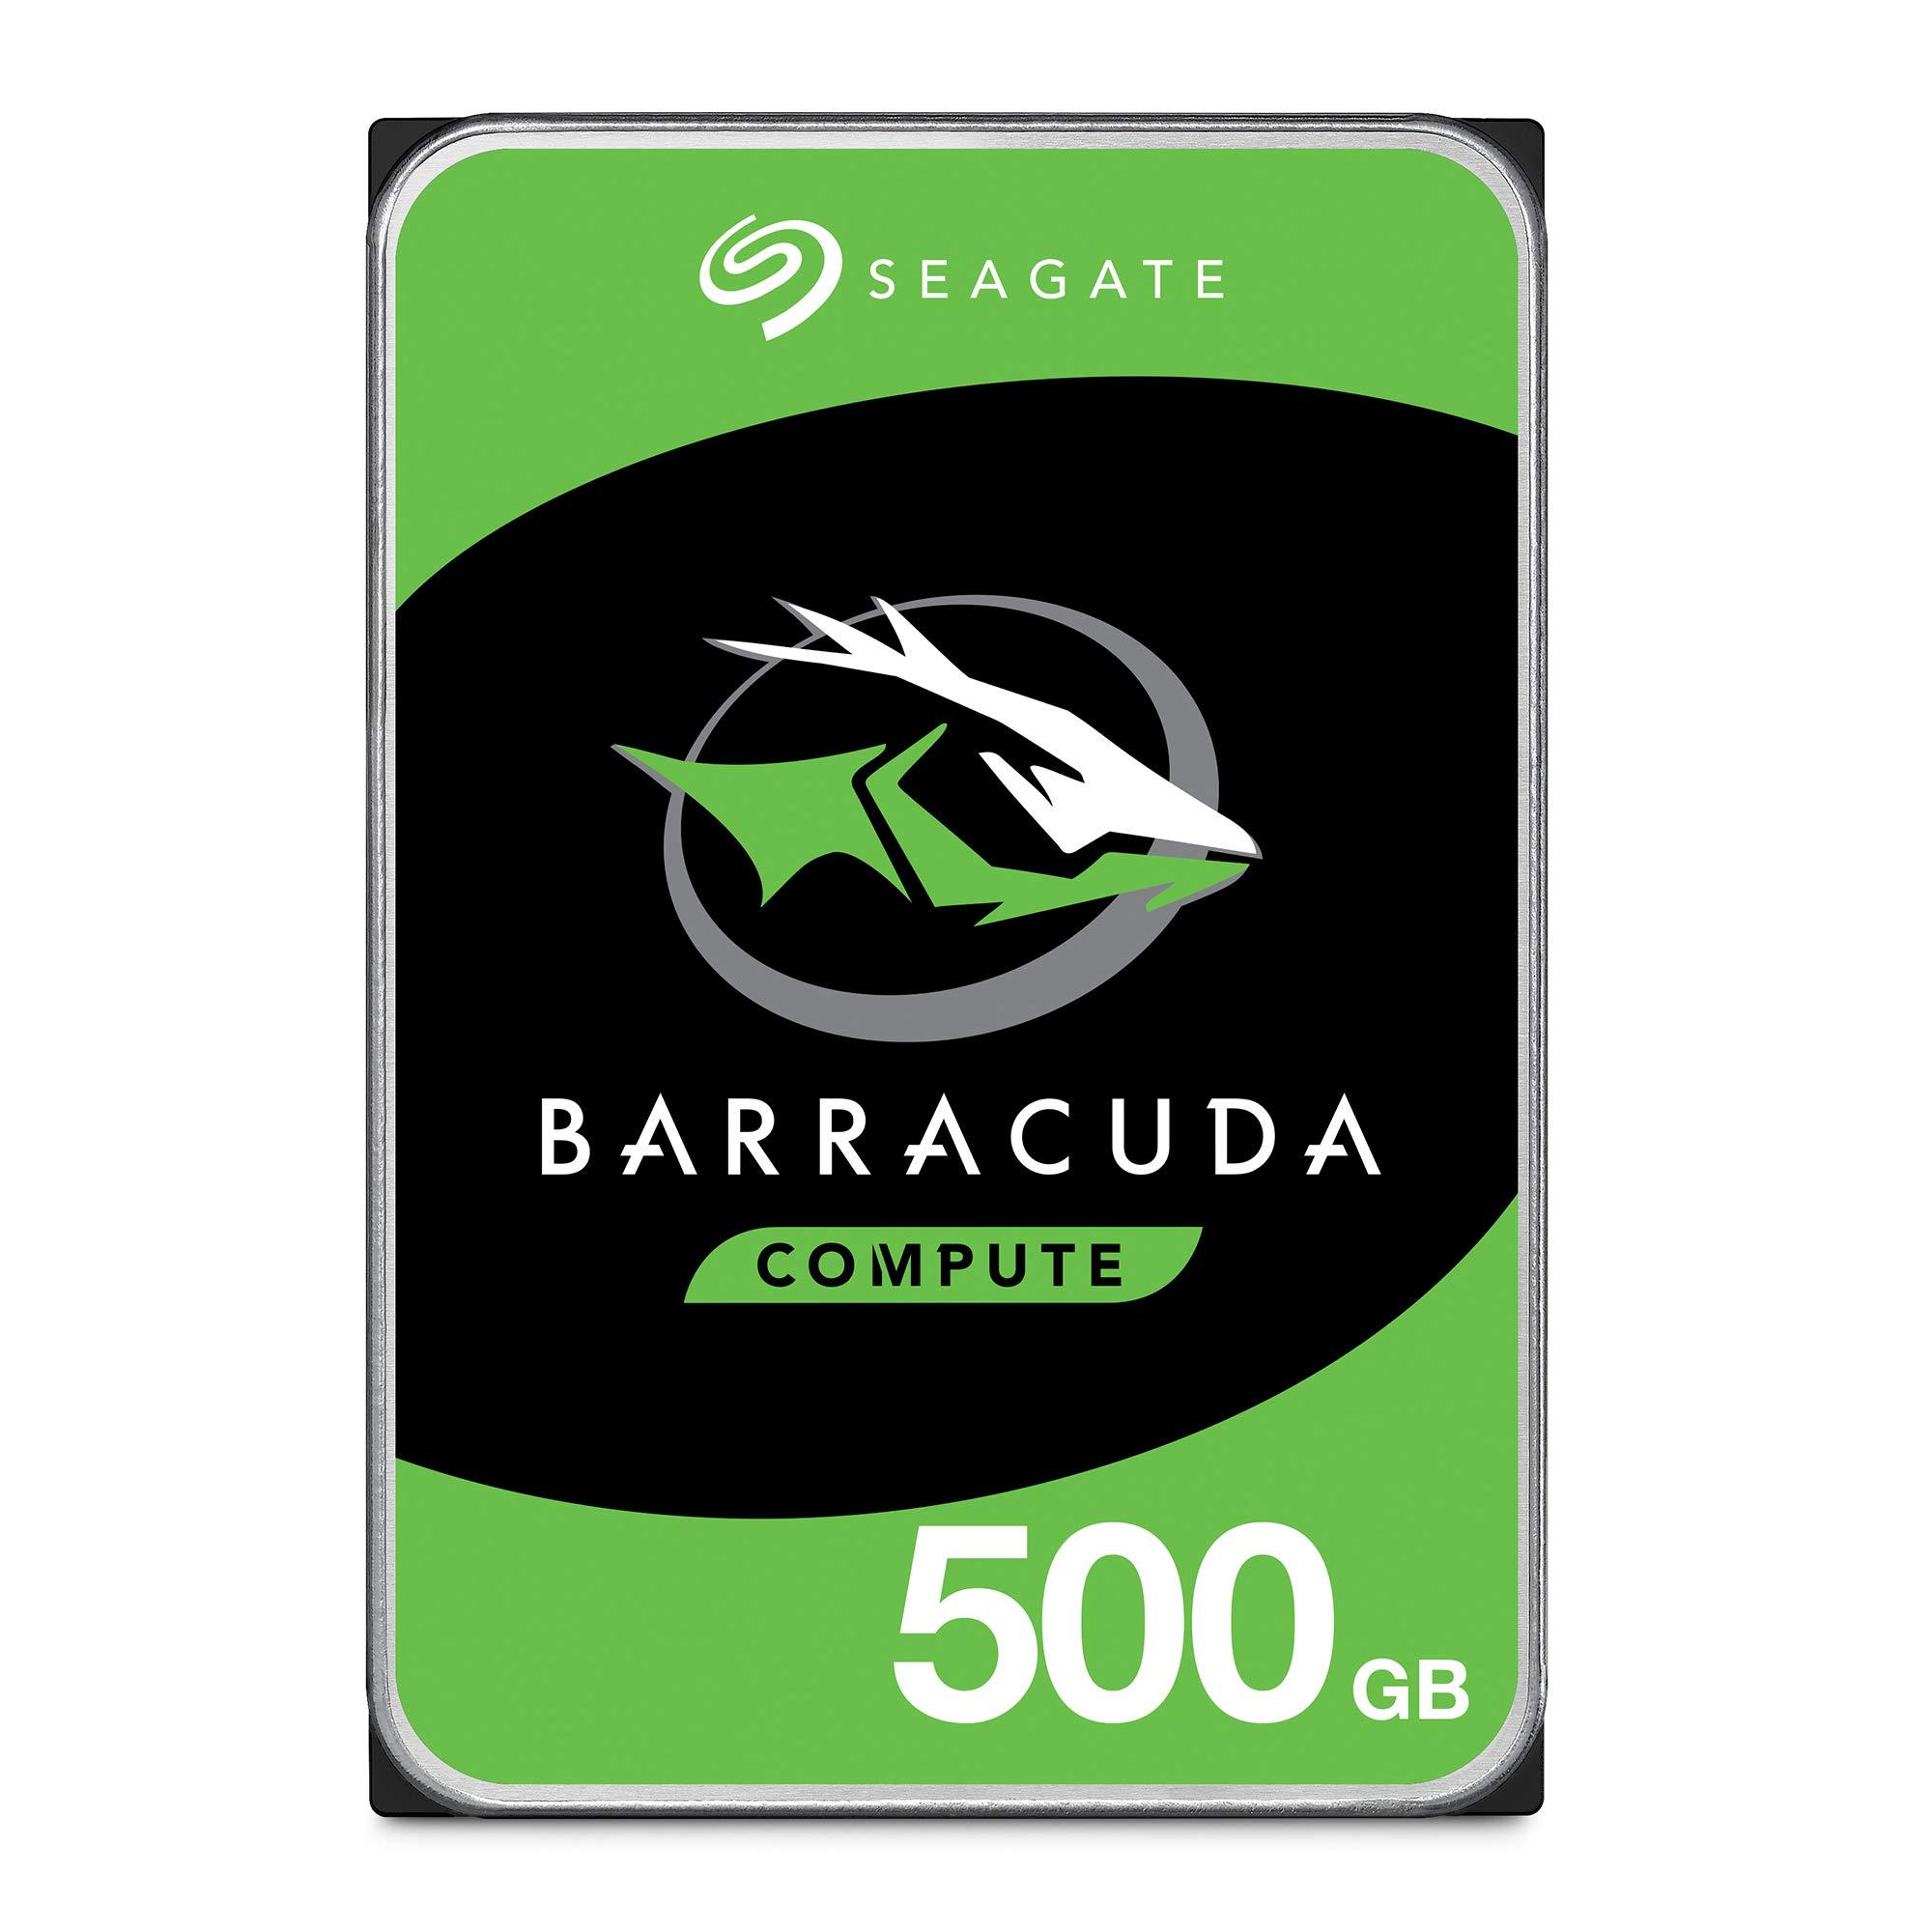 Seagate BarraCuda 500GB Internal Hard Drive HDD - 3.5 Inch SATA 6 Gb/s 7200 RPM 32MB Cache for Computer Desktop PC (ST500DM009) by Seagate